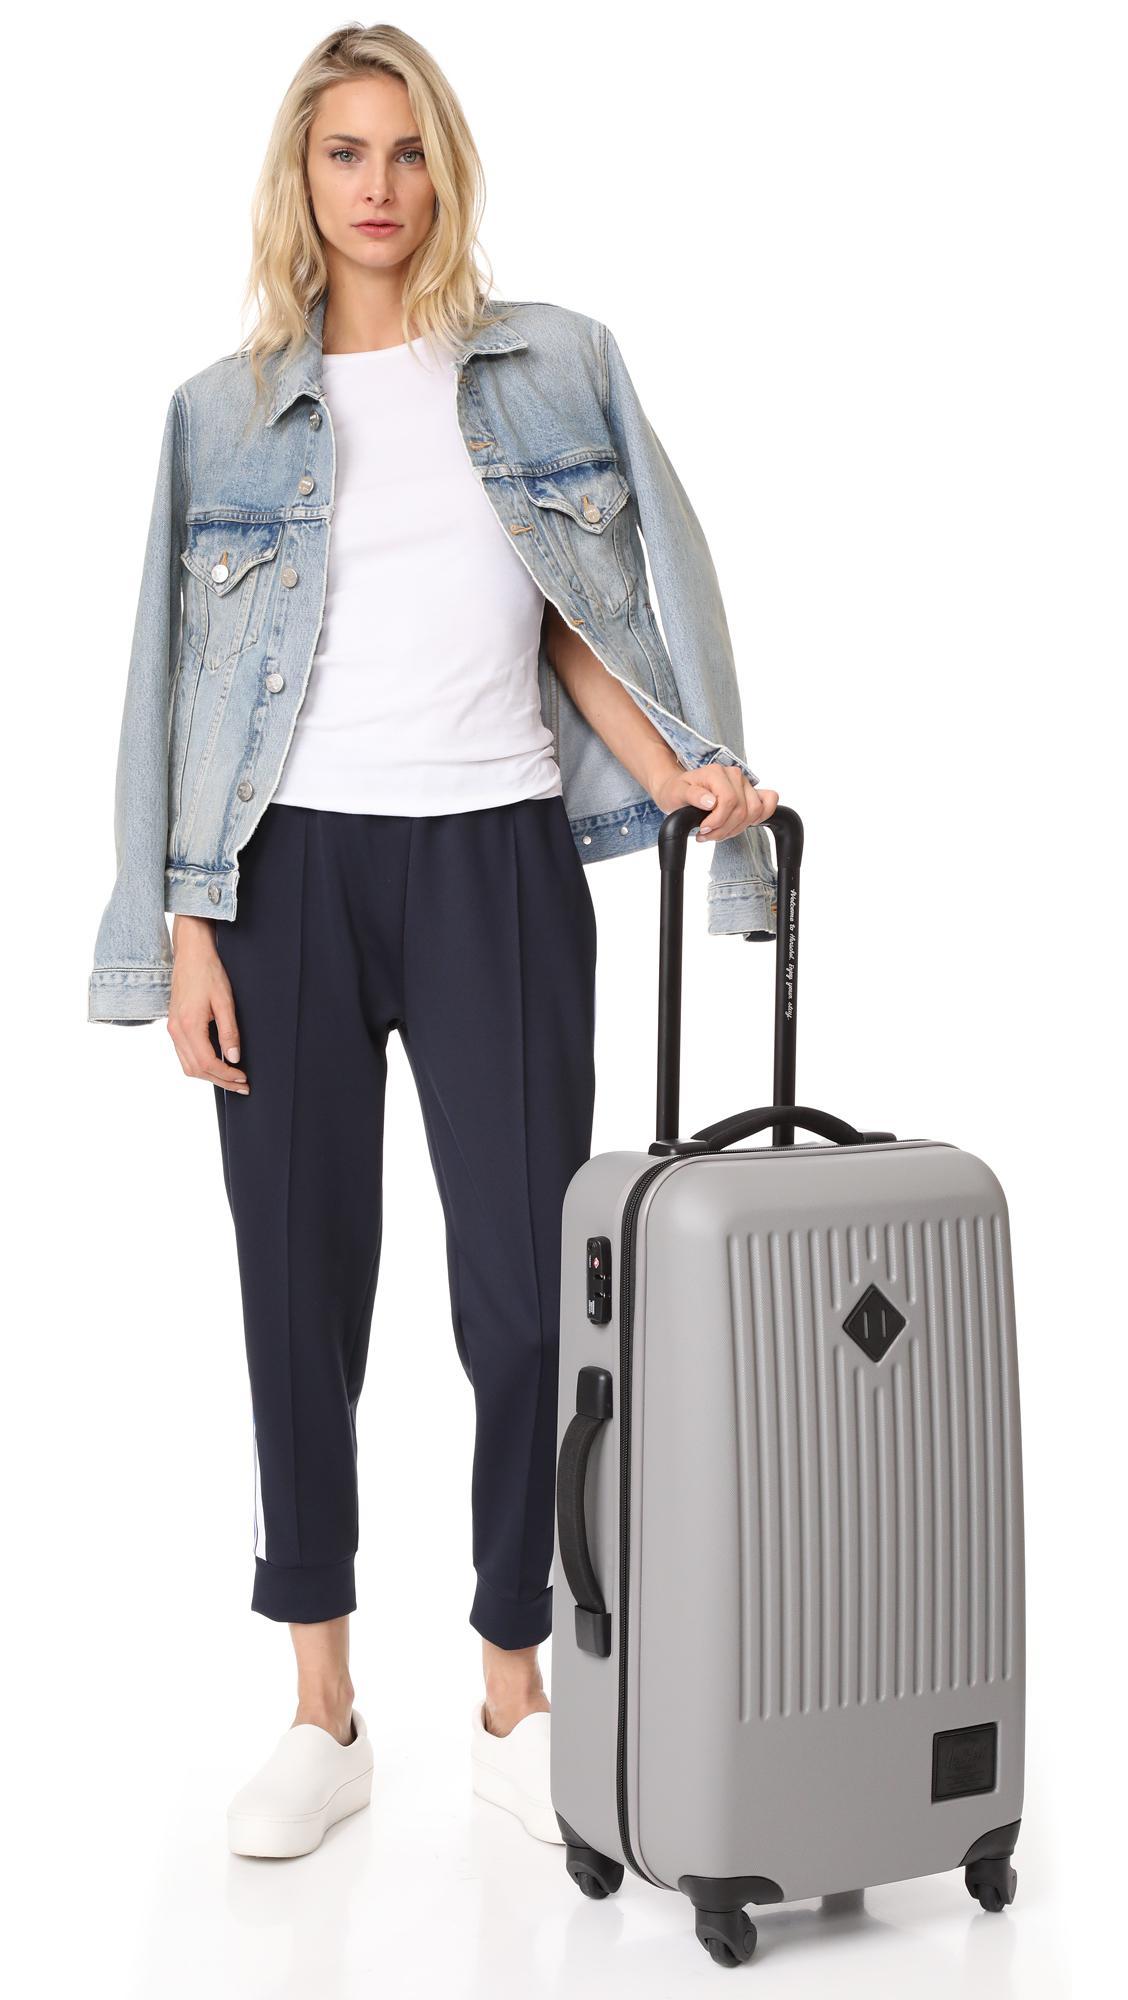 822eaf638 Herschel Supply Co. Trade Medium Suitcase in Gray - Lyst